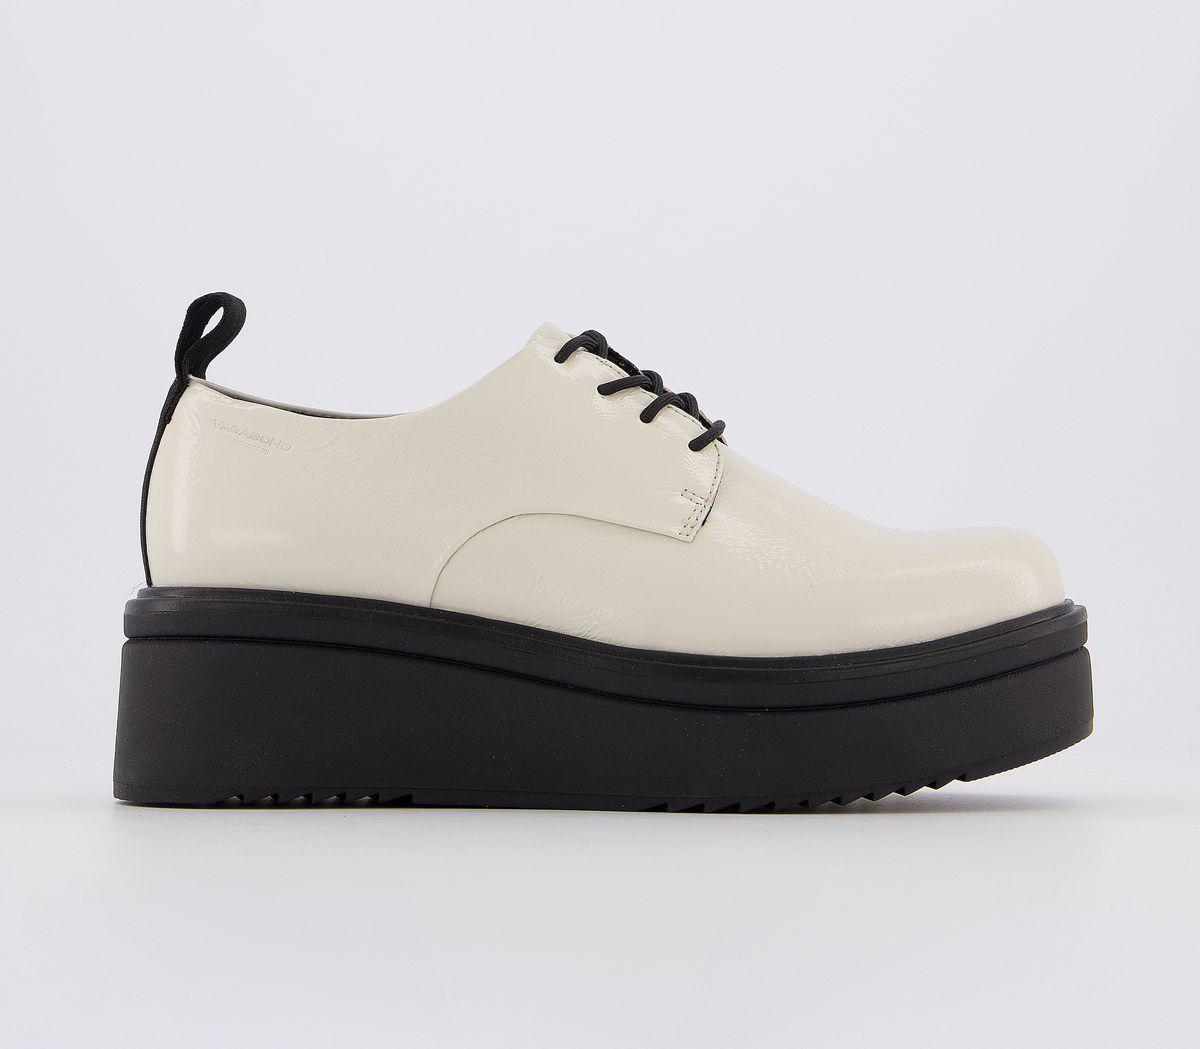 Detalles de Mujer Vagabond Tara Zapatos Blanco Roto Planos